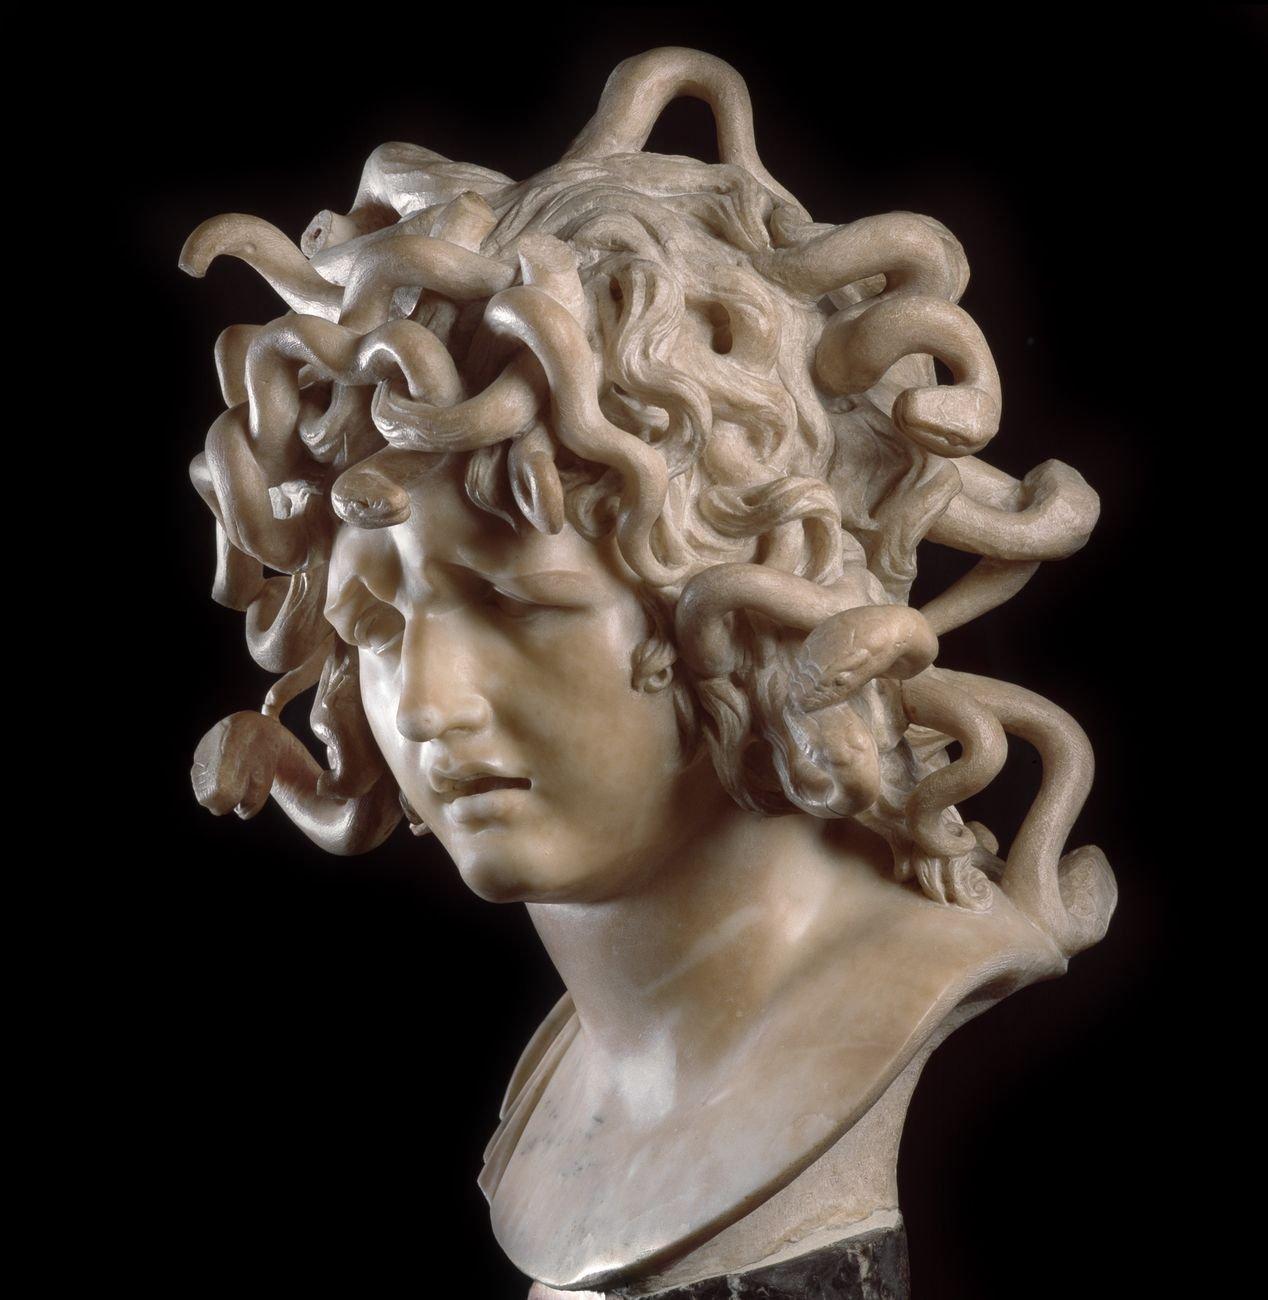 Gian Lorenzo Bernini, Medusa, Musei Capitolini, Palazzo dei Conservatori, Roma © Pinacoteca Capitolina, Roma © Photo Andrea Jemolo